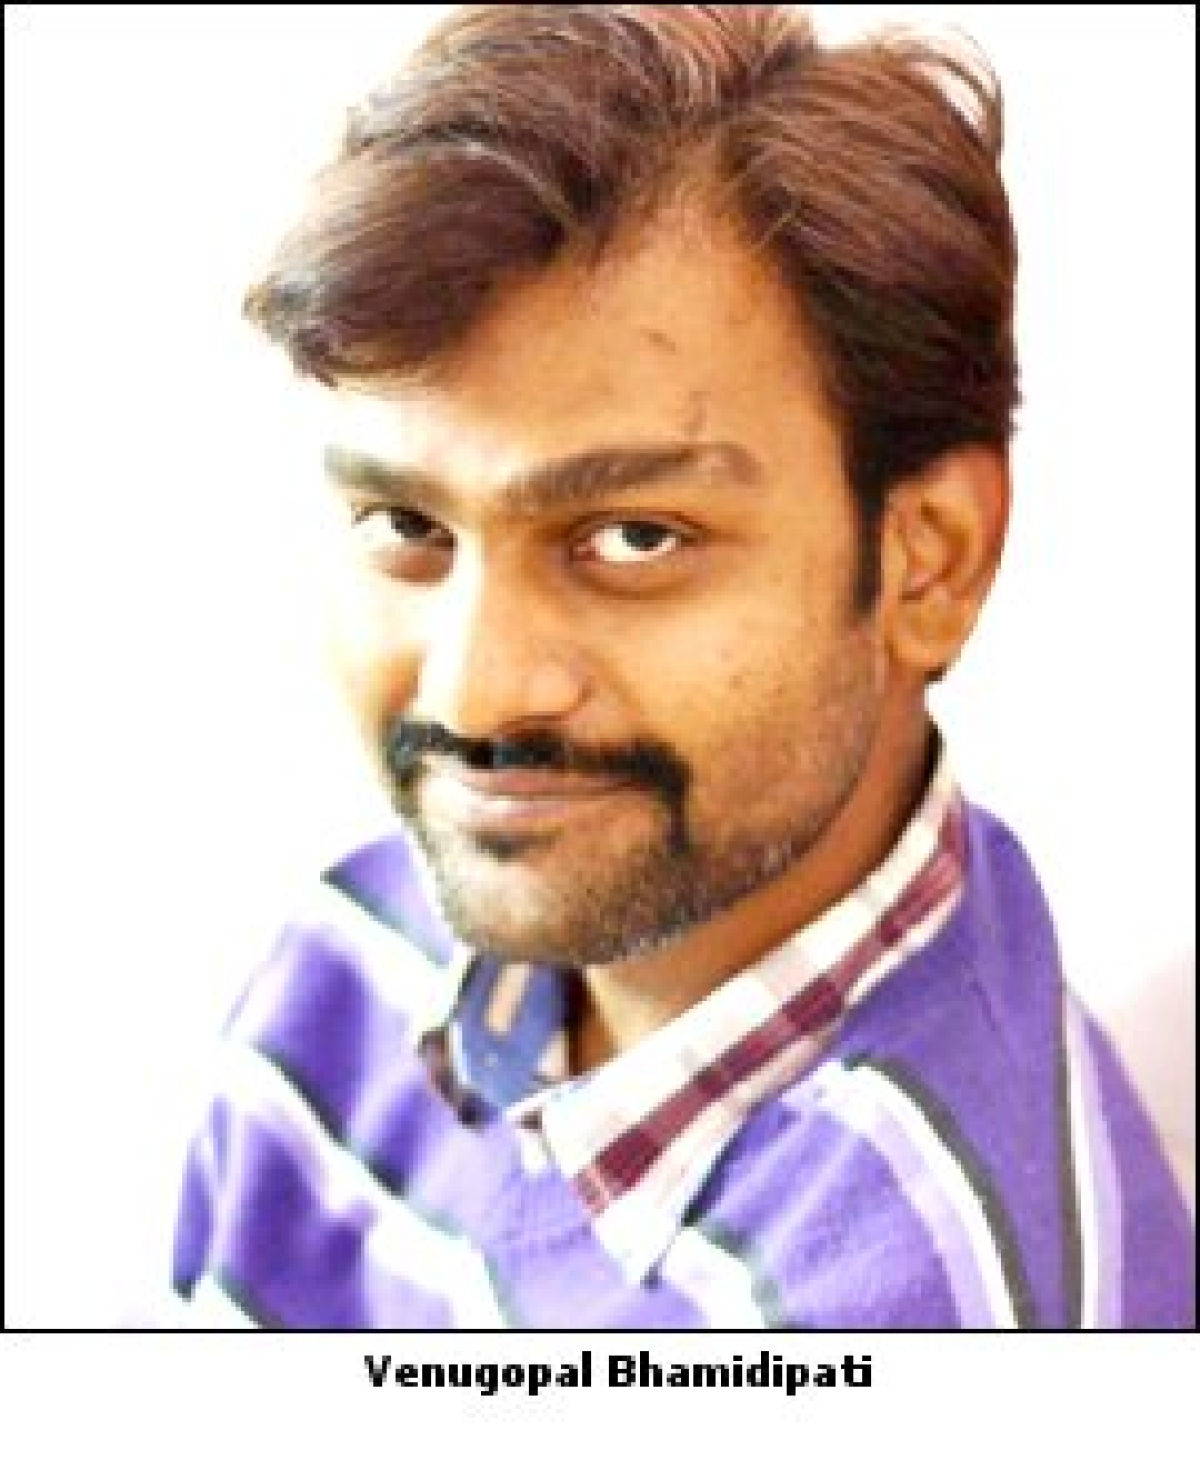 Ormax Media appoints Venugopal Bhamidipati as insights head